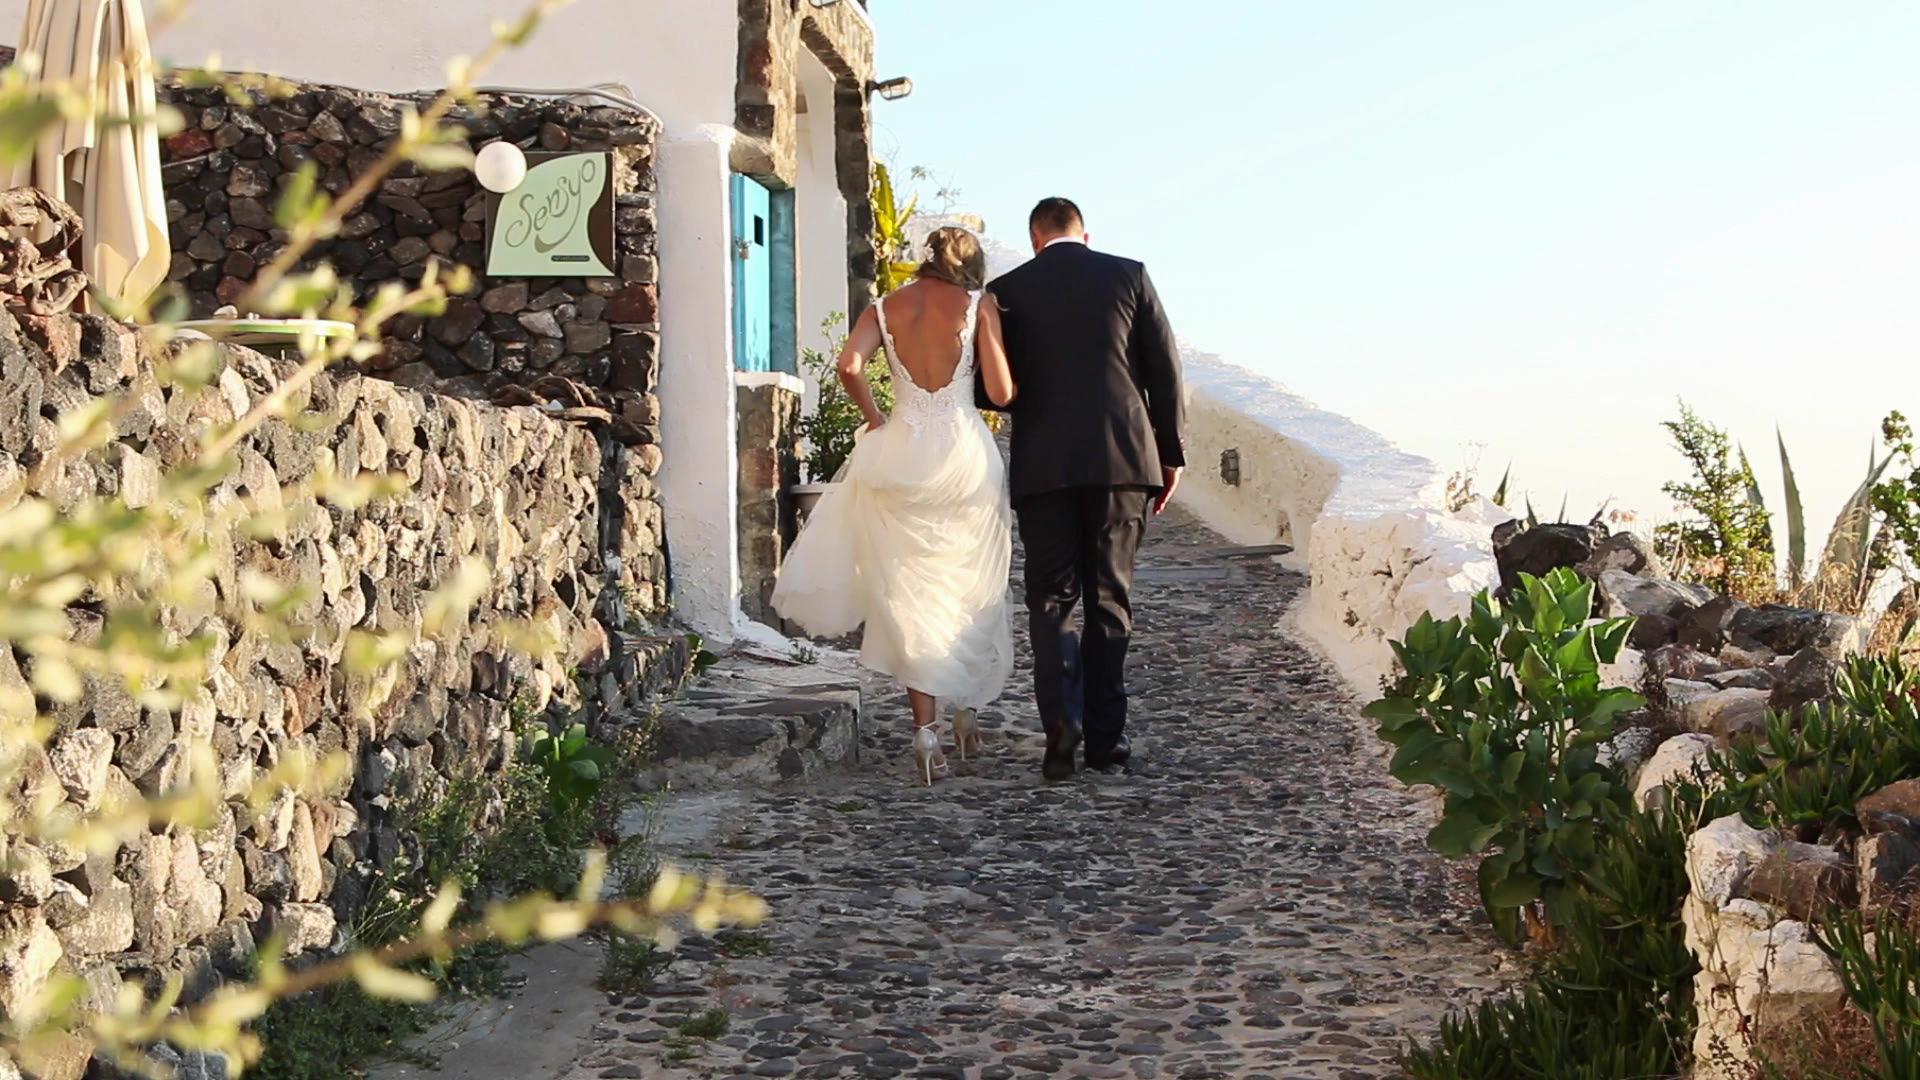 Wedding Videography Santorini - Santorini Wedding Photo Shoot